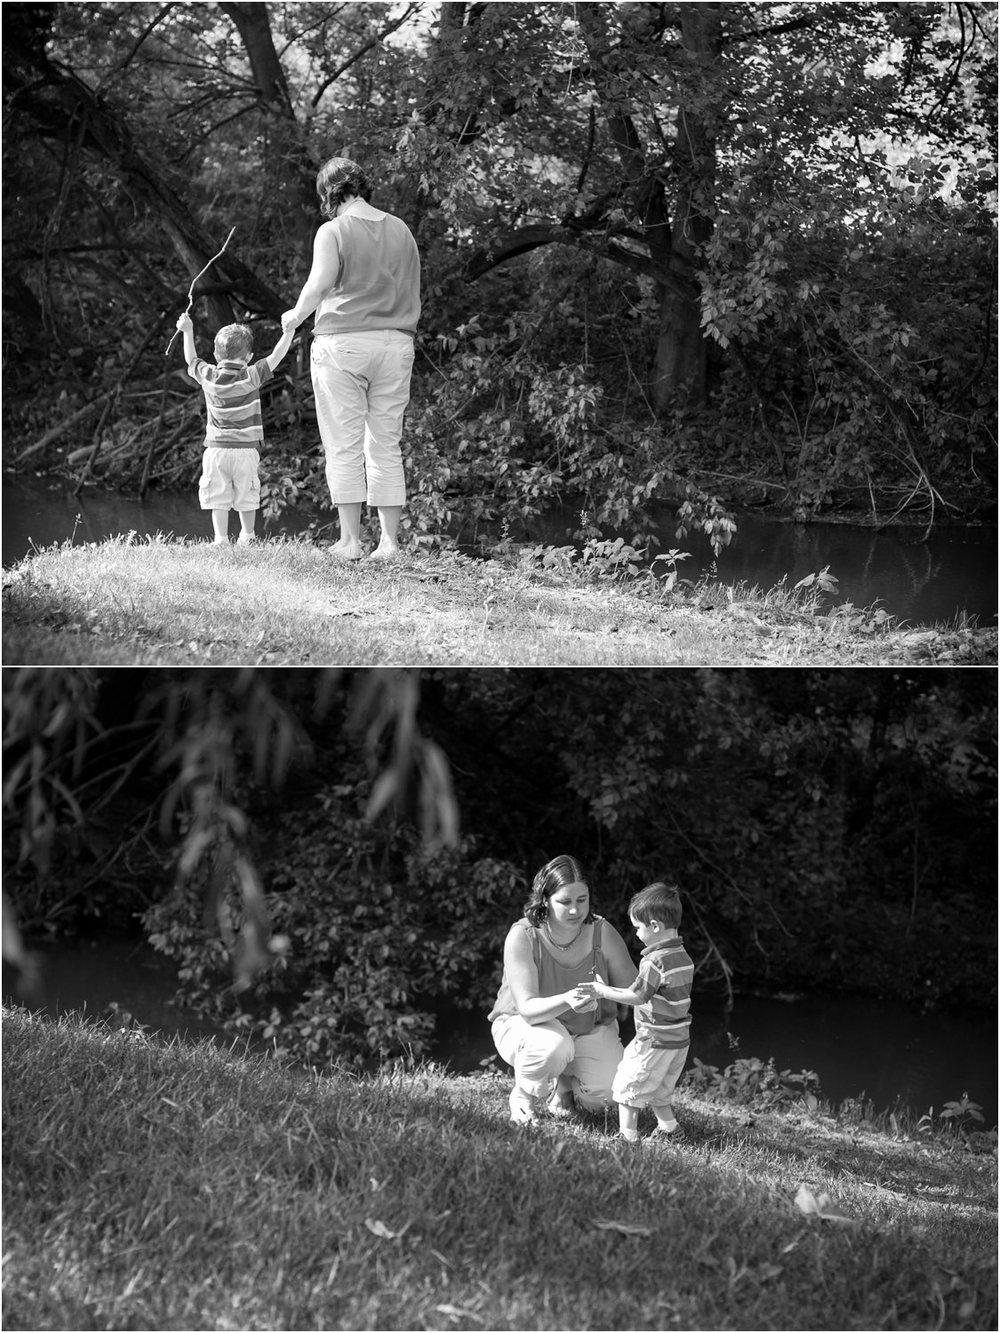 Bridgewater_Arboretum_Family_Portraits_Groggs_0003.jpg